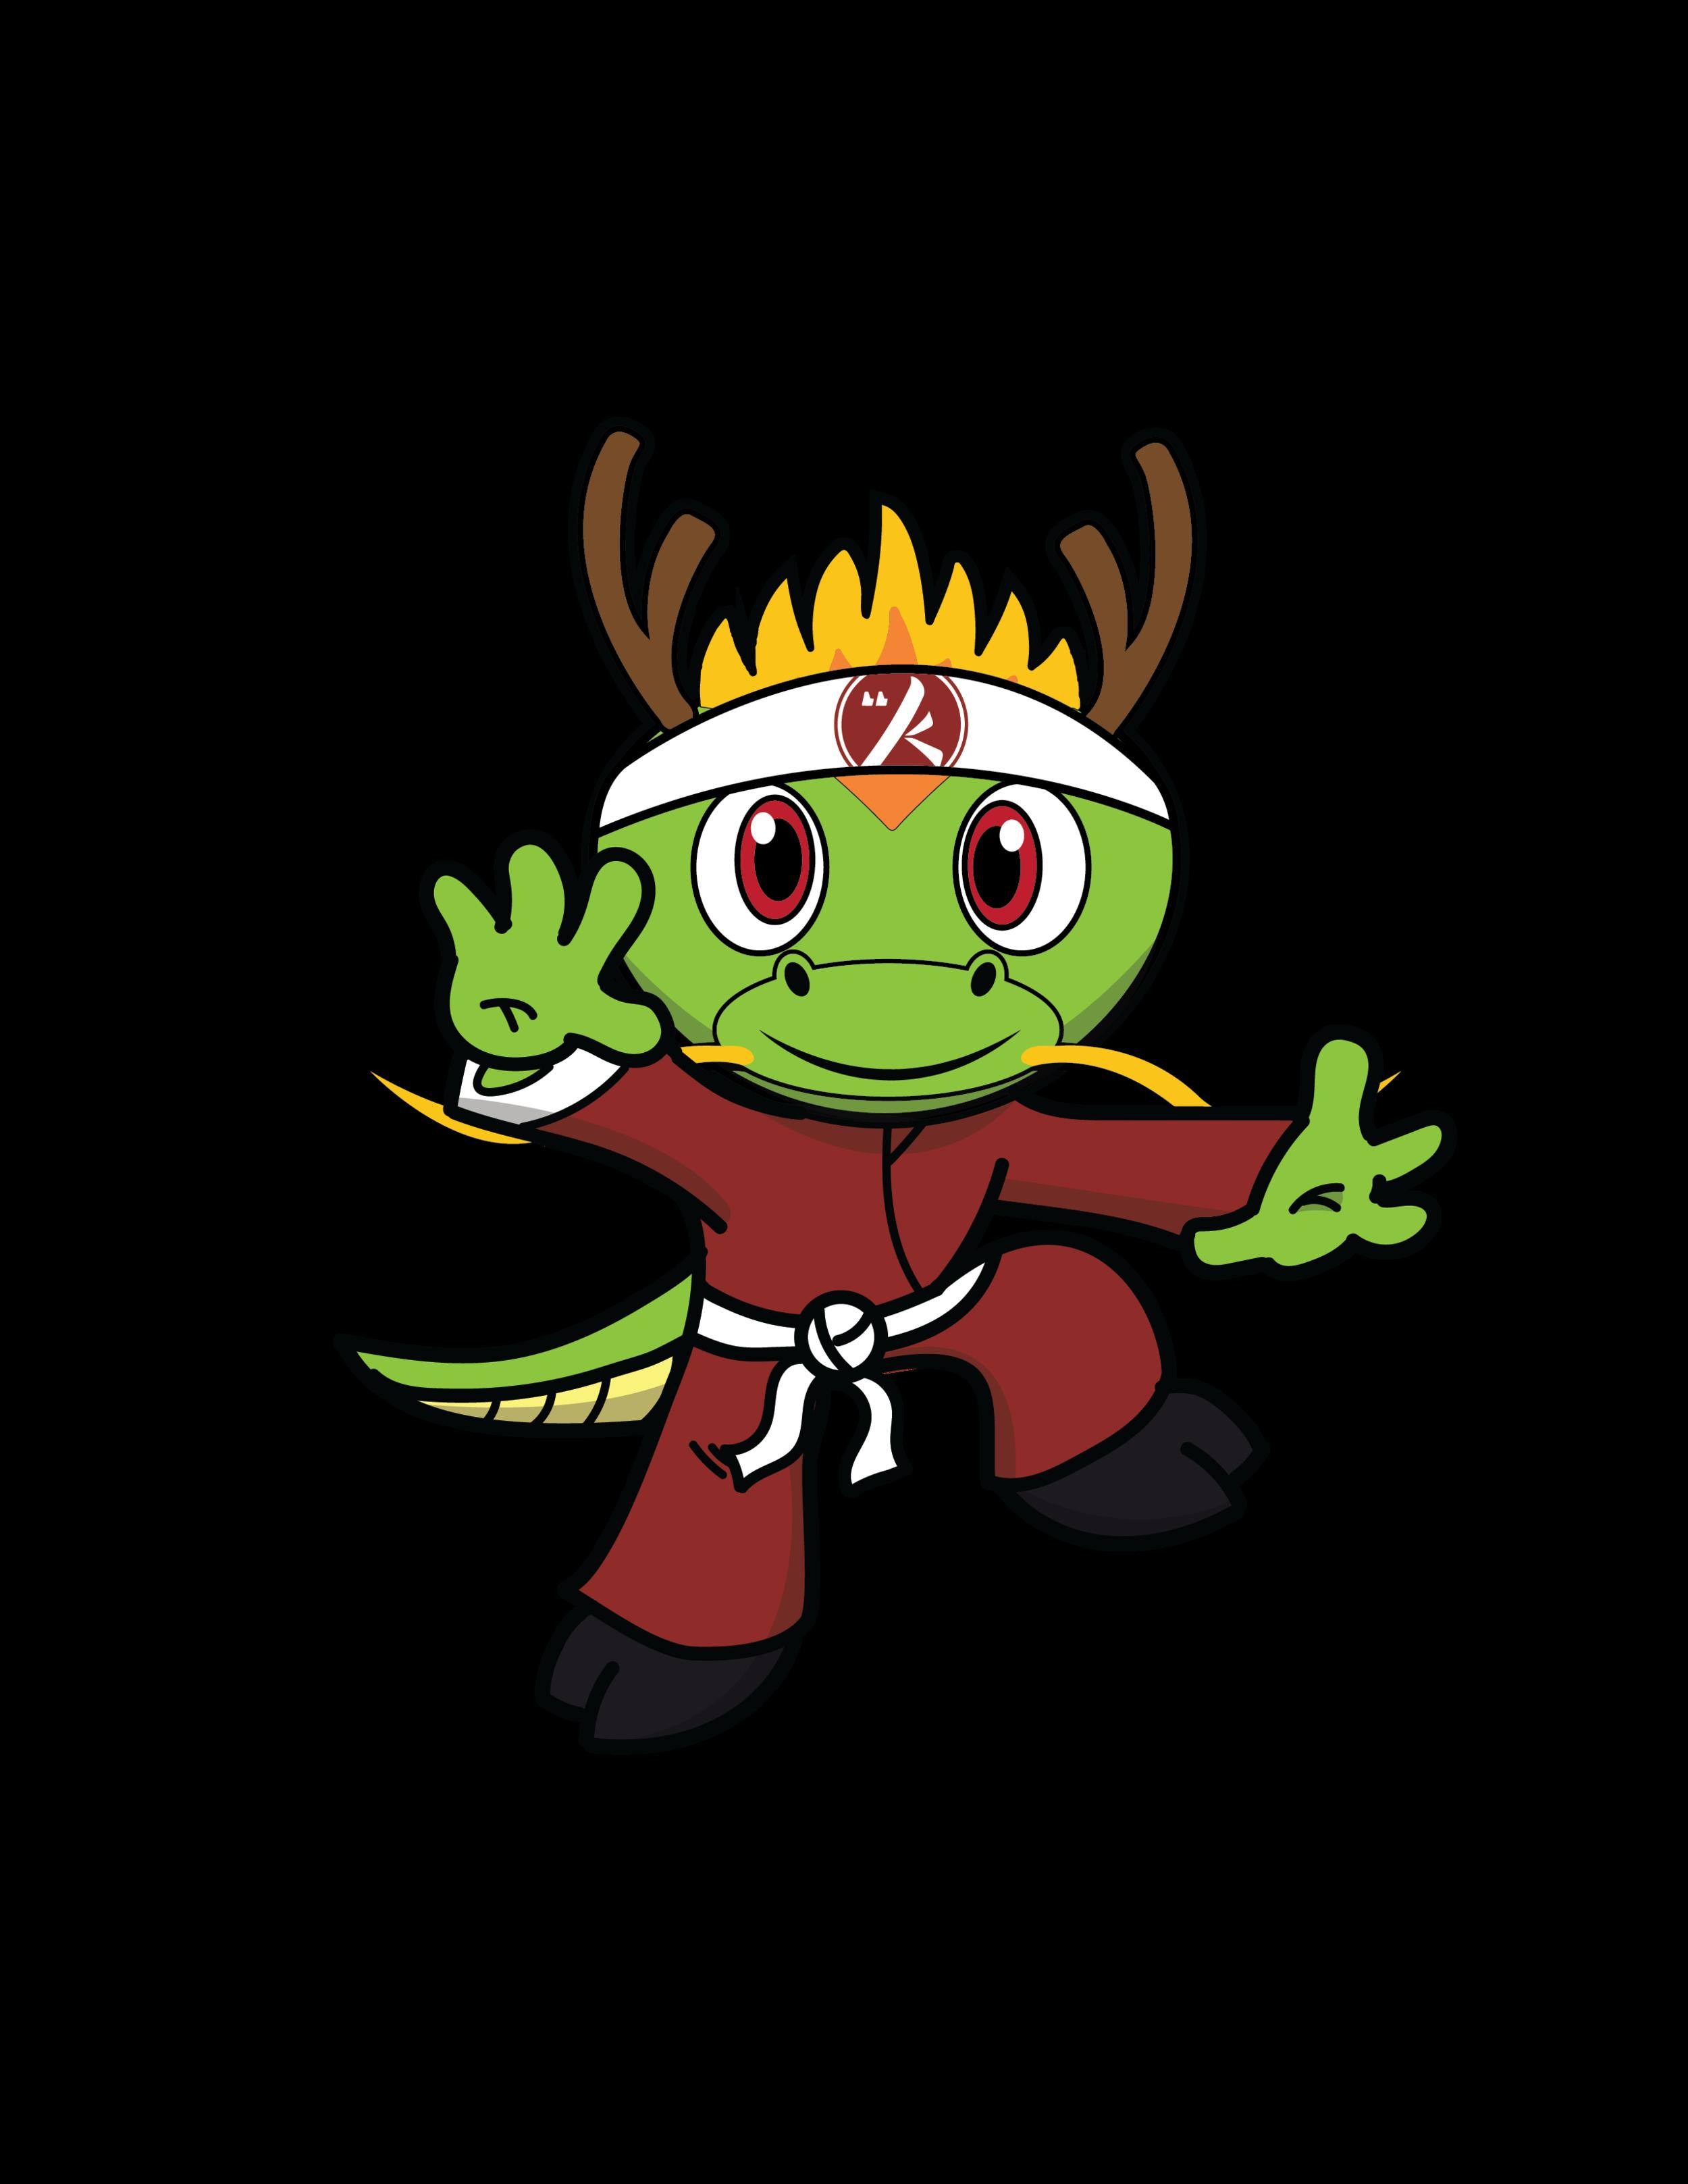 ninja_dragon_pose_3_red_suit-03.png